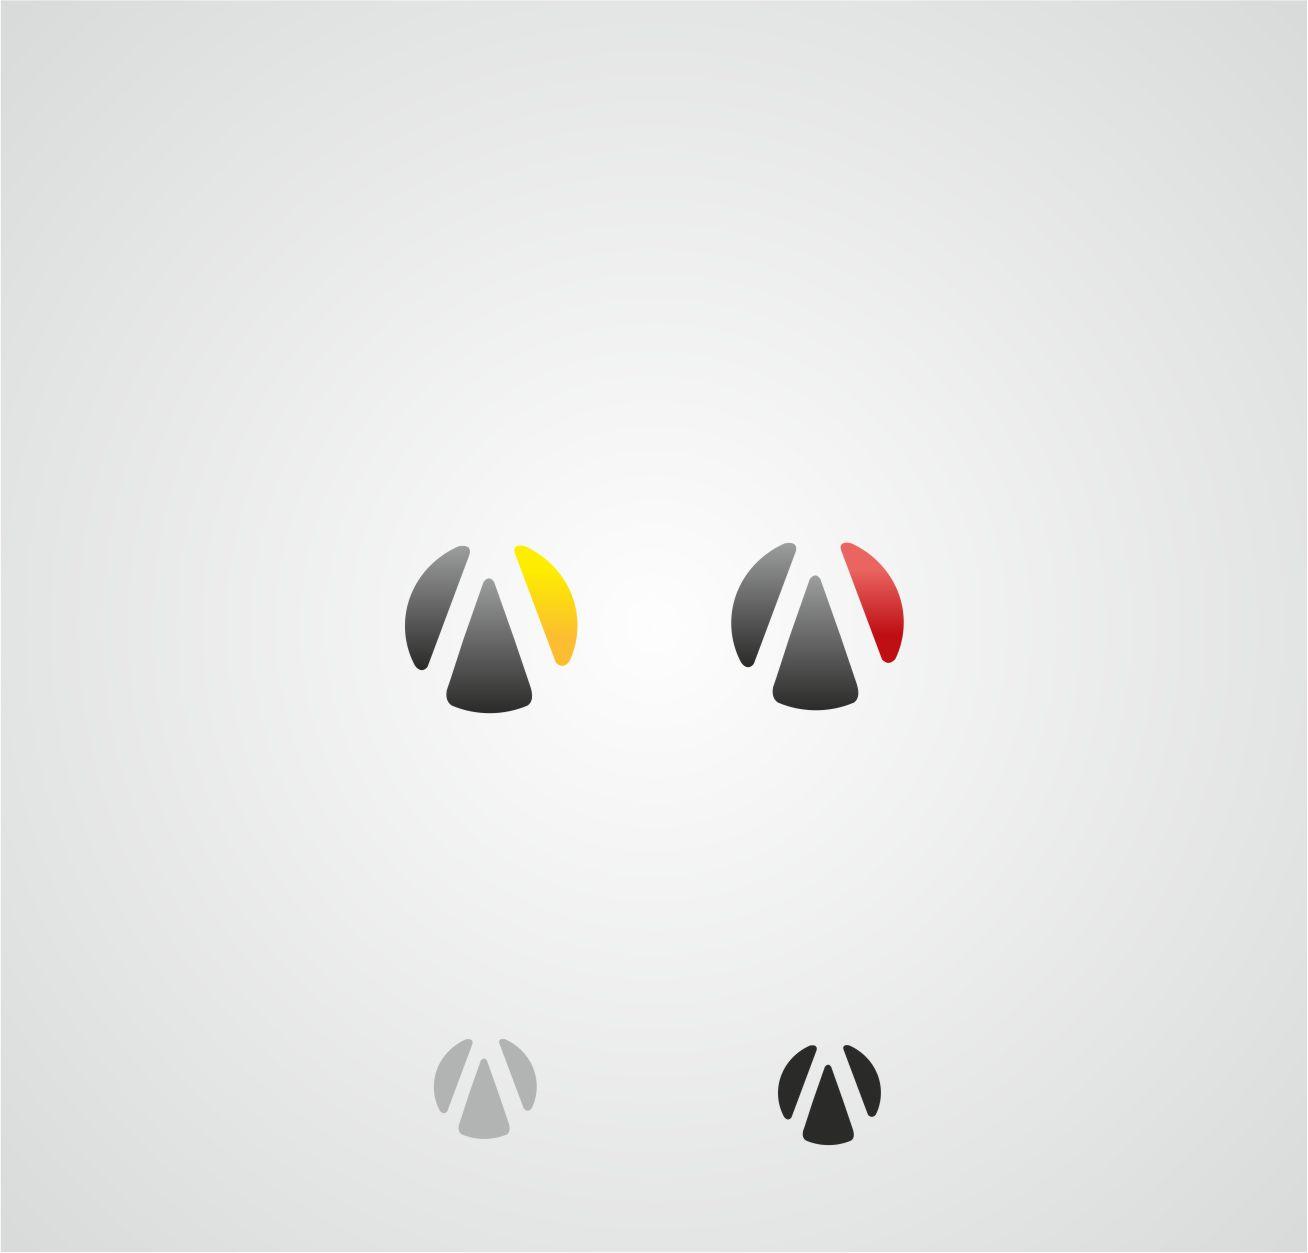 Лого и фирменный стиль (бланк, визитка) фото f_1075186d0b62ac0f.jpg